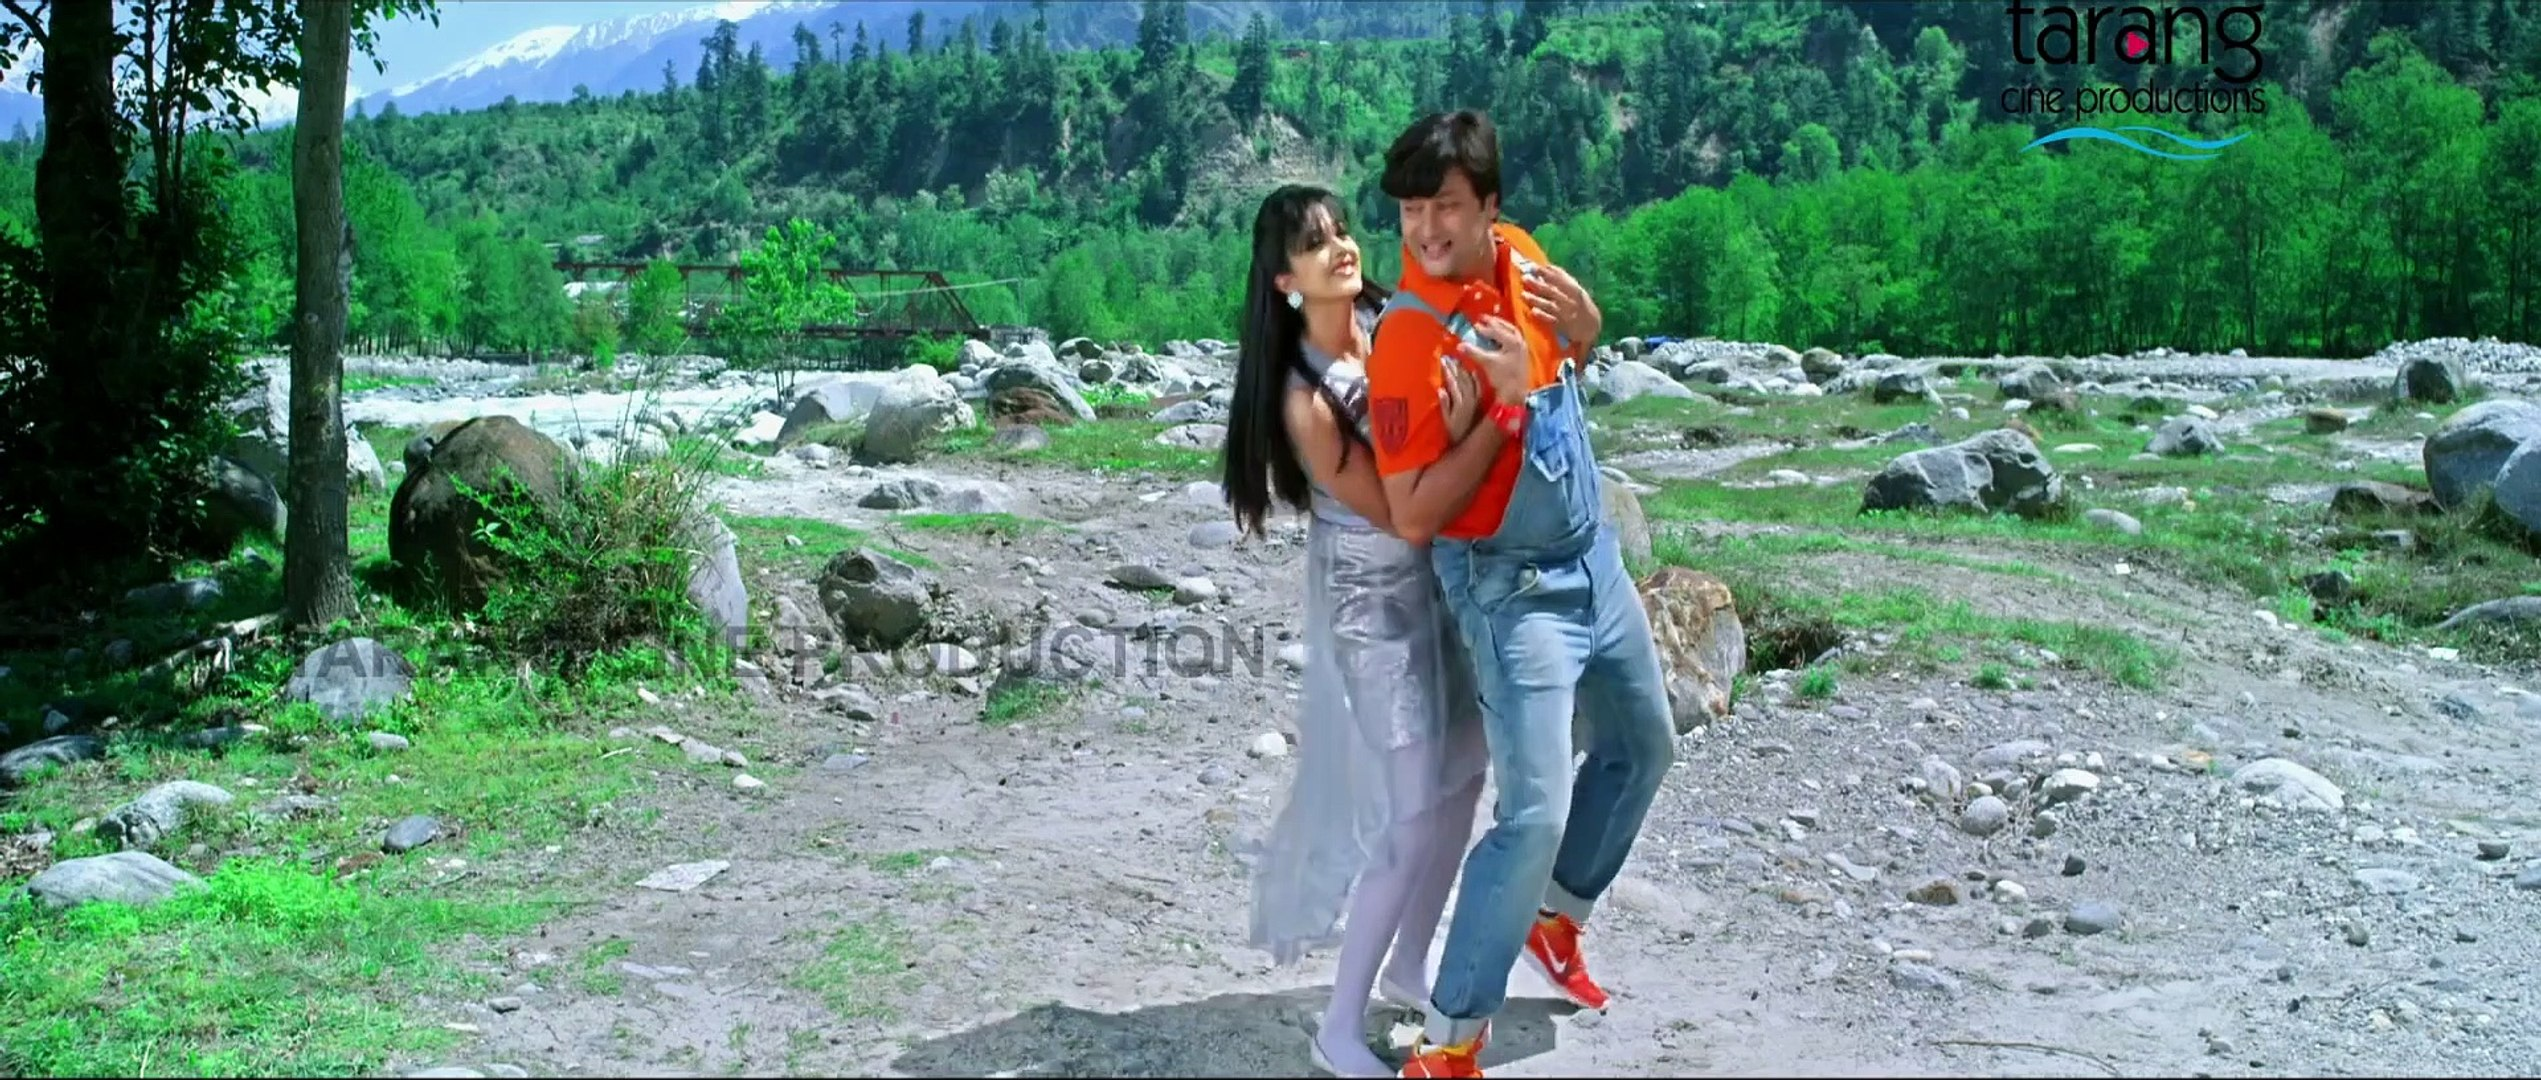 Gapa Hele Bi Sata Title  HD Video Song - Gapa Hele Bi Sata Odia Film -Anubhab Mohanty, Barsha Priyad